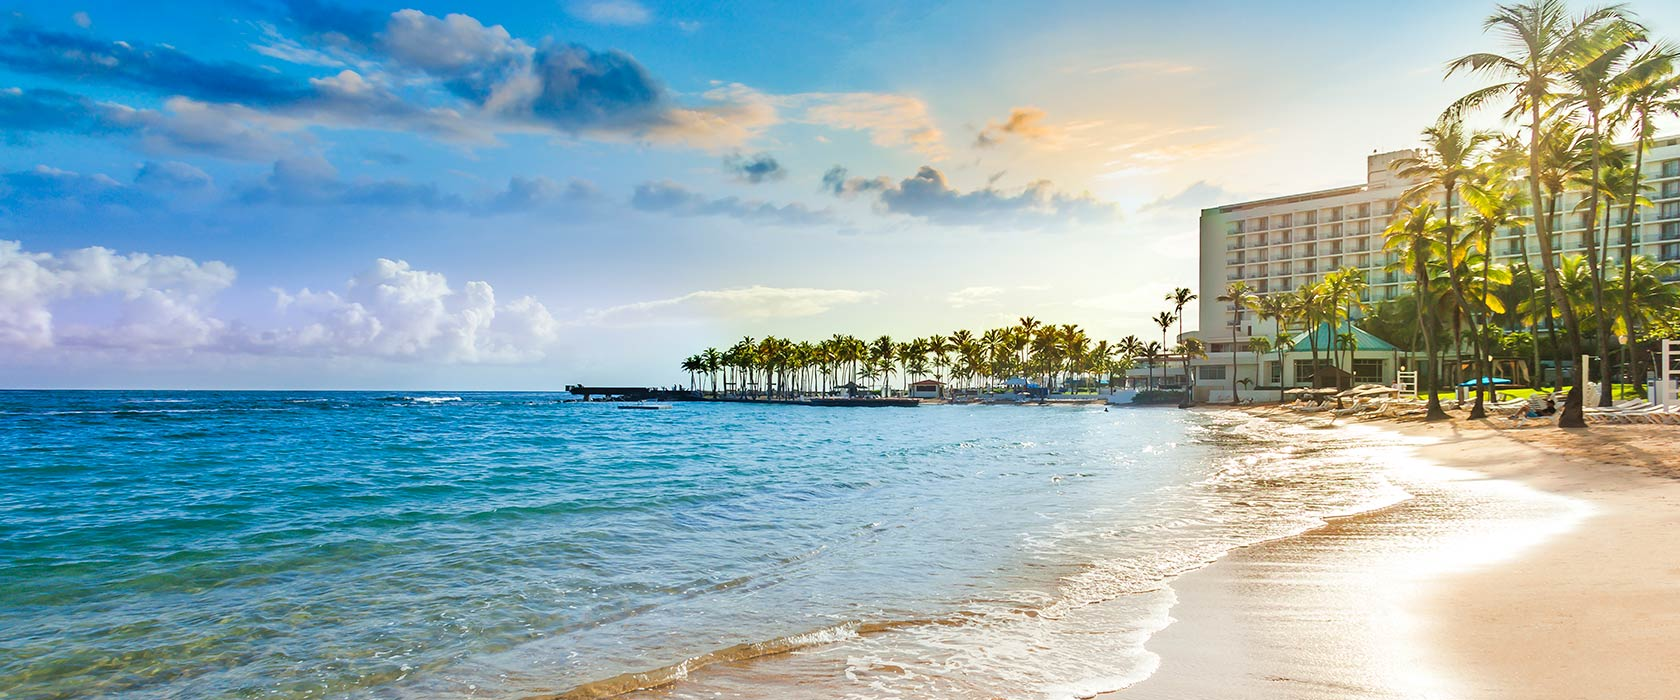 caribe-hilton-masthead-seafront-beach-location-1680x700